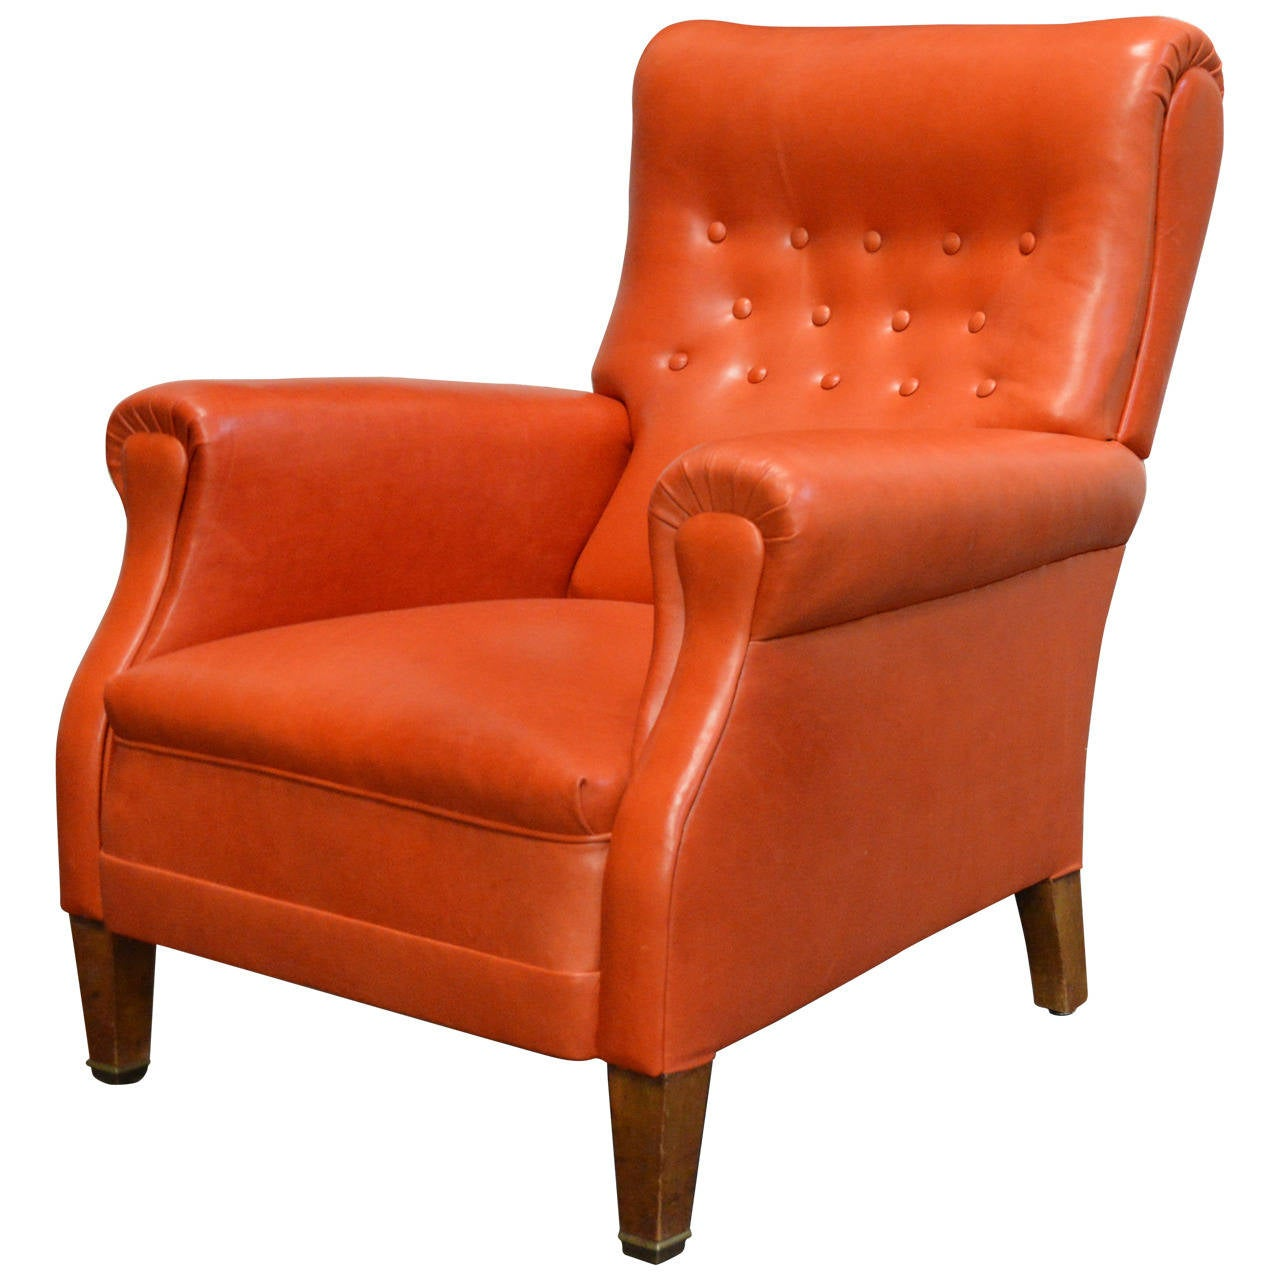 Vintage Swedish Orange Leather Lounge Chair at 1stdibs